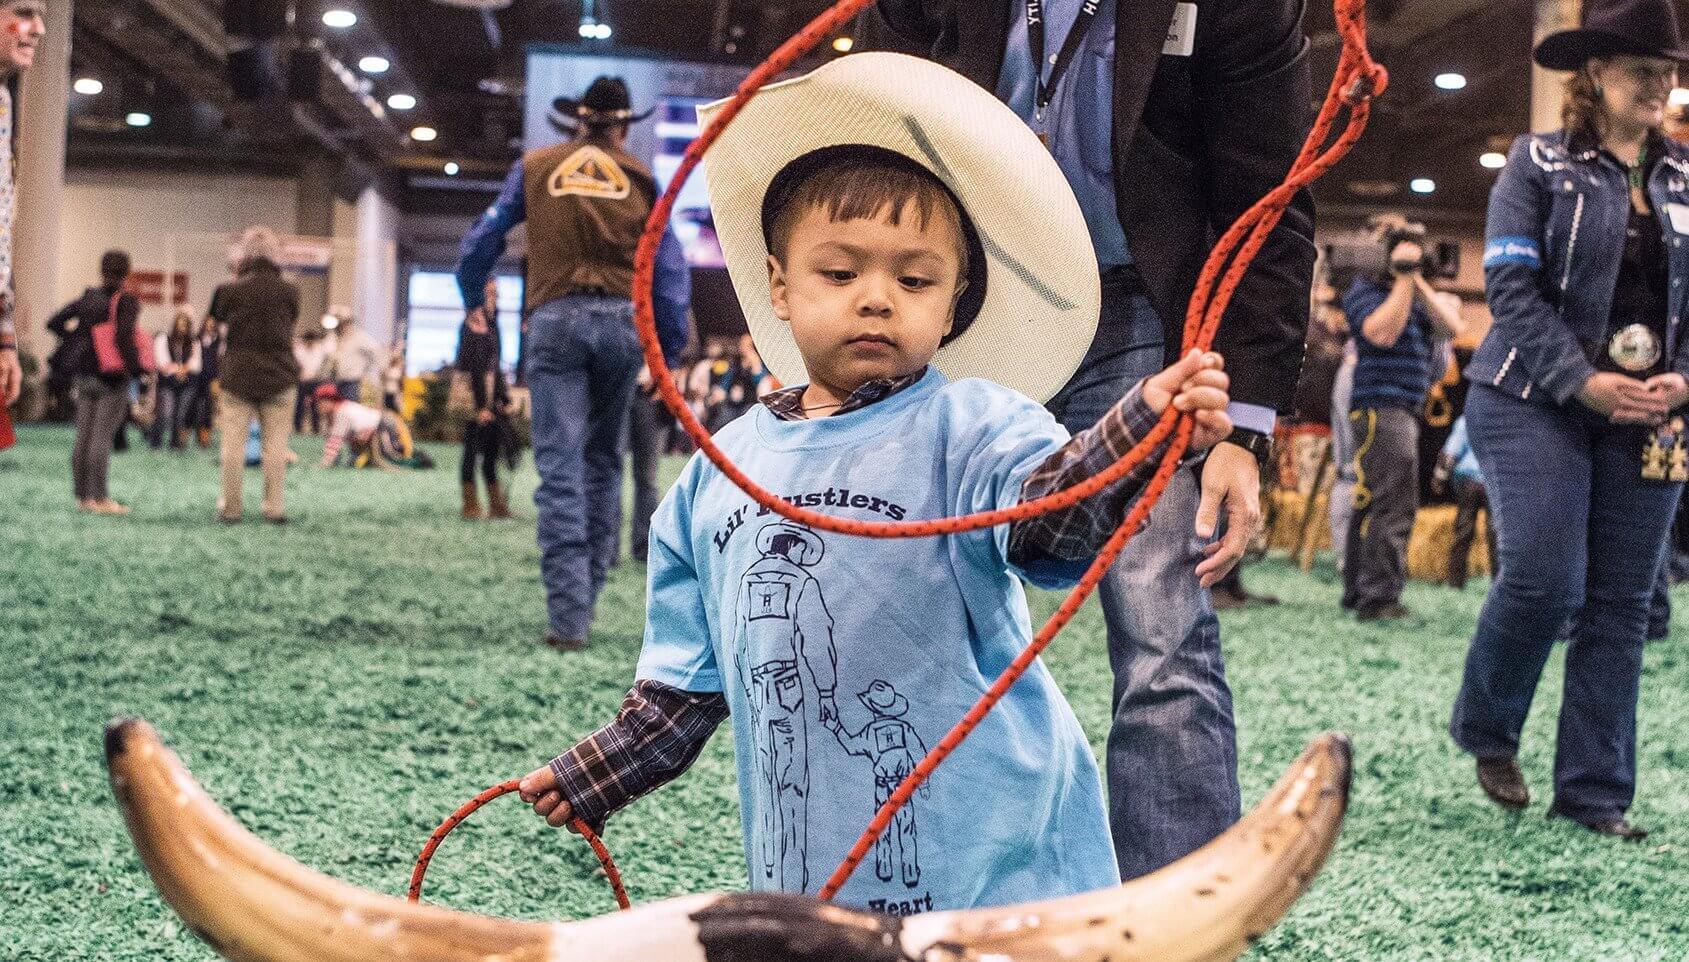 Three-year-old Caleb ropes a steer under the watchful eye of his volunteer cowboy.